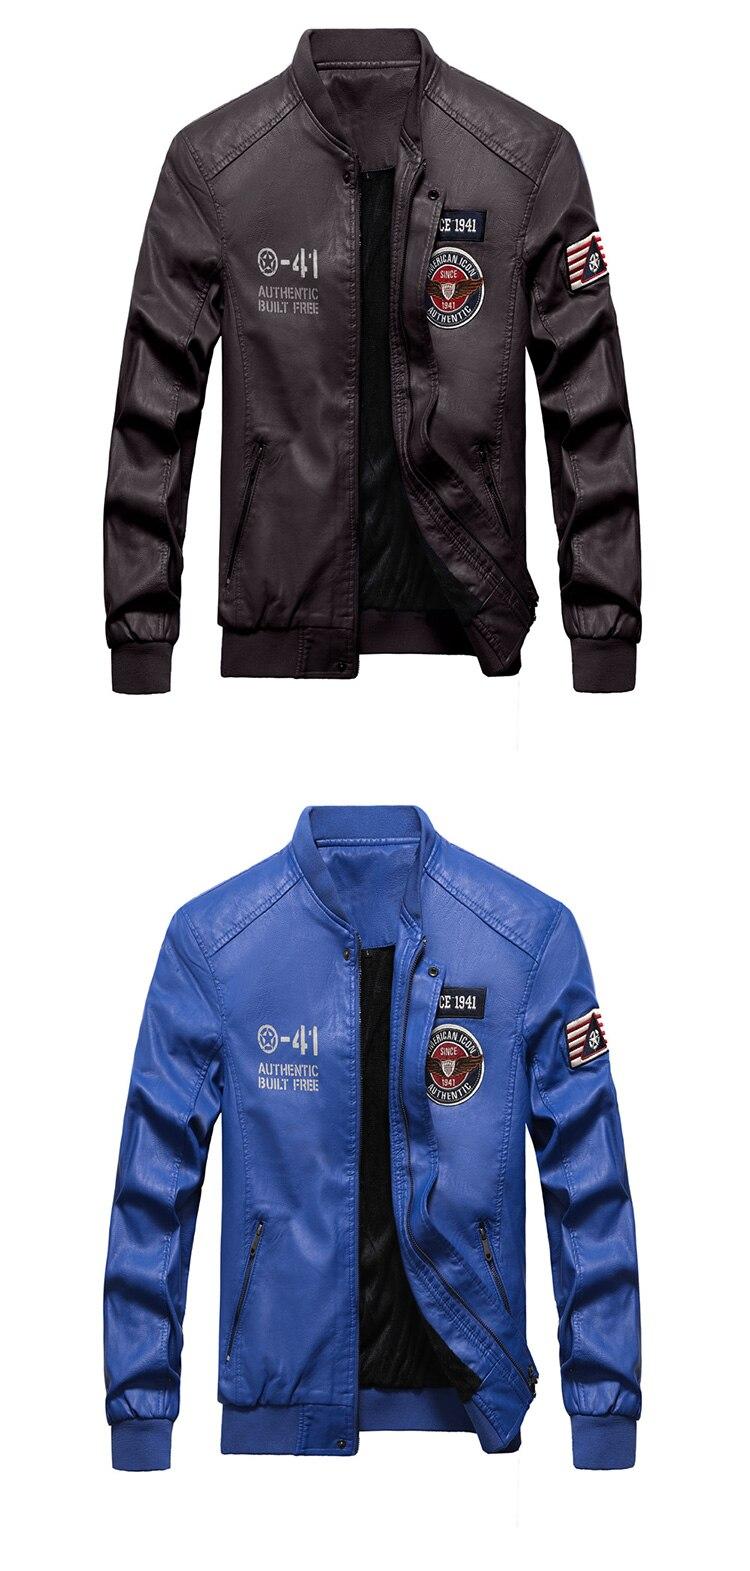 2019 Fashion Leather Bomber Jacket Men Autumn Winter Military Jackets Male Fleece Liner Outwear Coats Warm PU Baseball Jackets